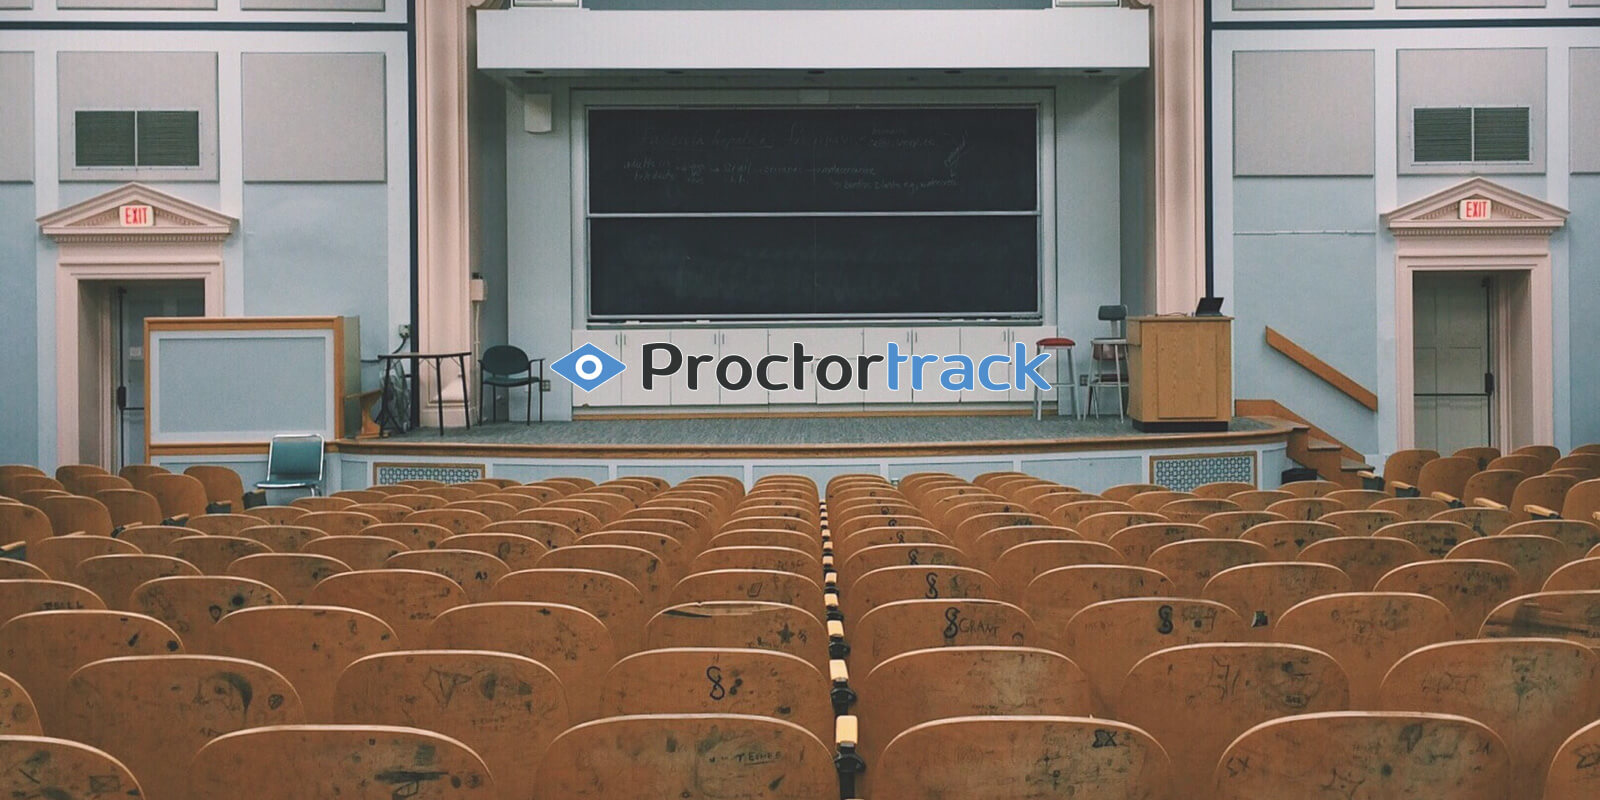 ProctorTrack